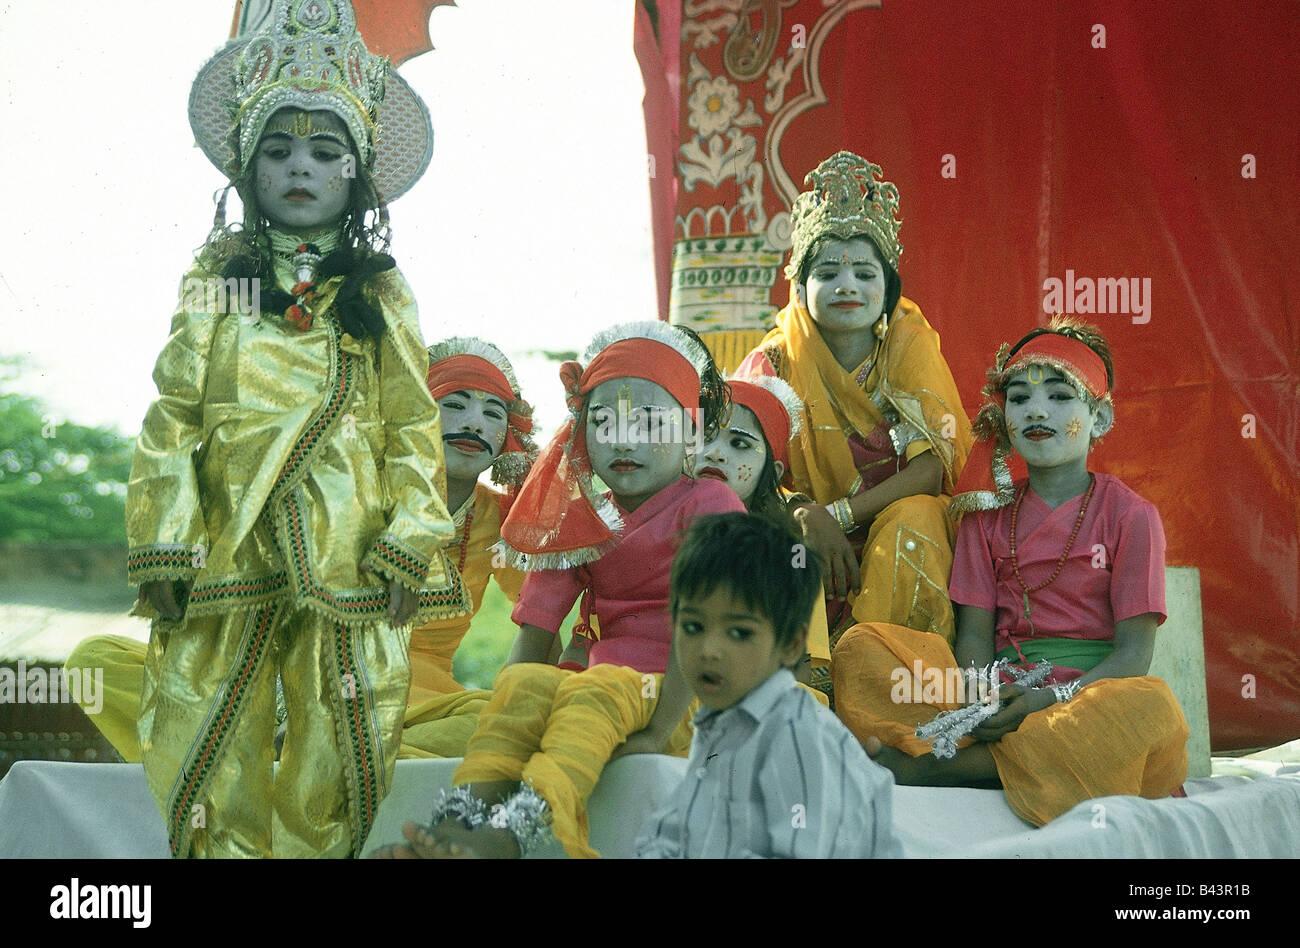 geography / travel, India, people, made-up children on the elephant celebration, Jaipur, Rajasthan, folklore, tradition, - Stock Image